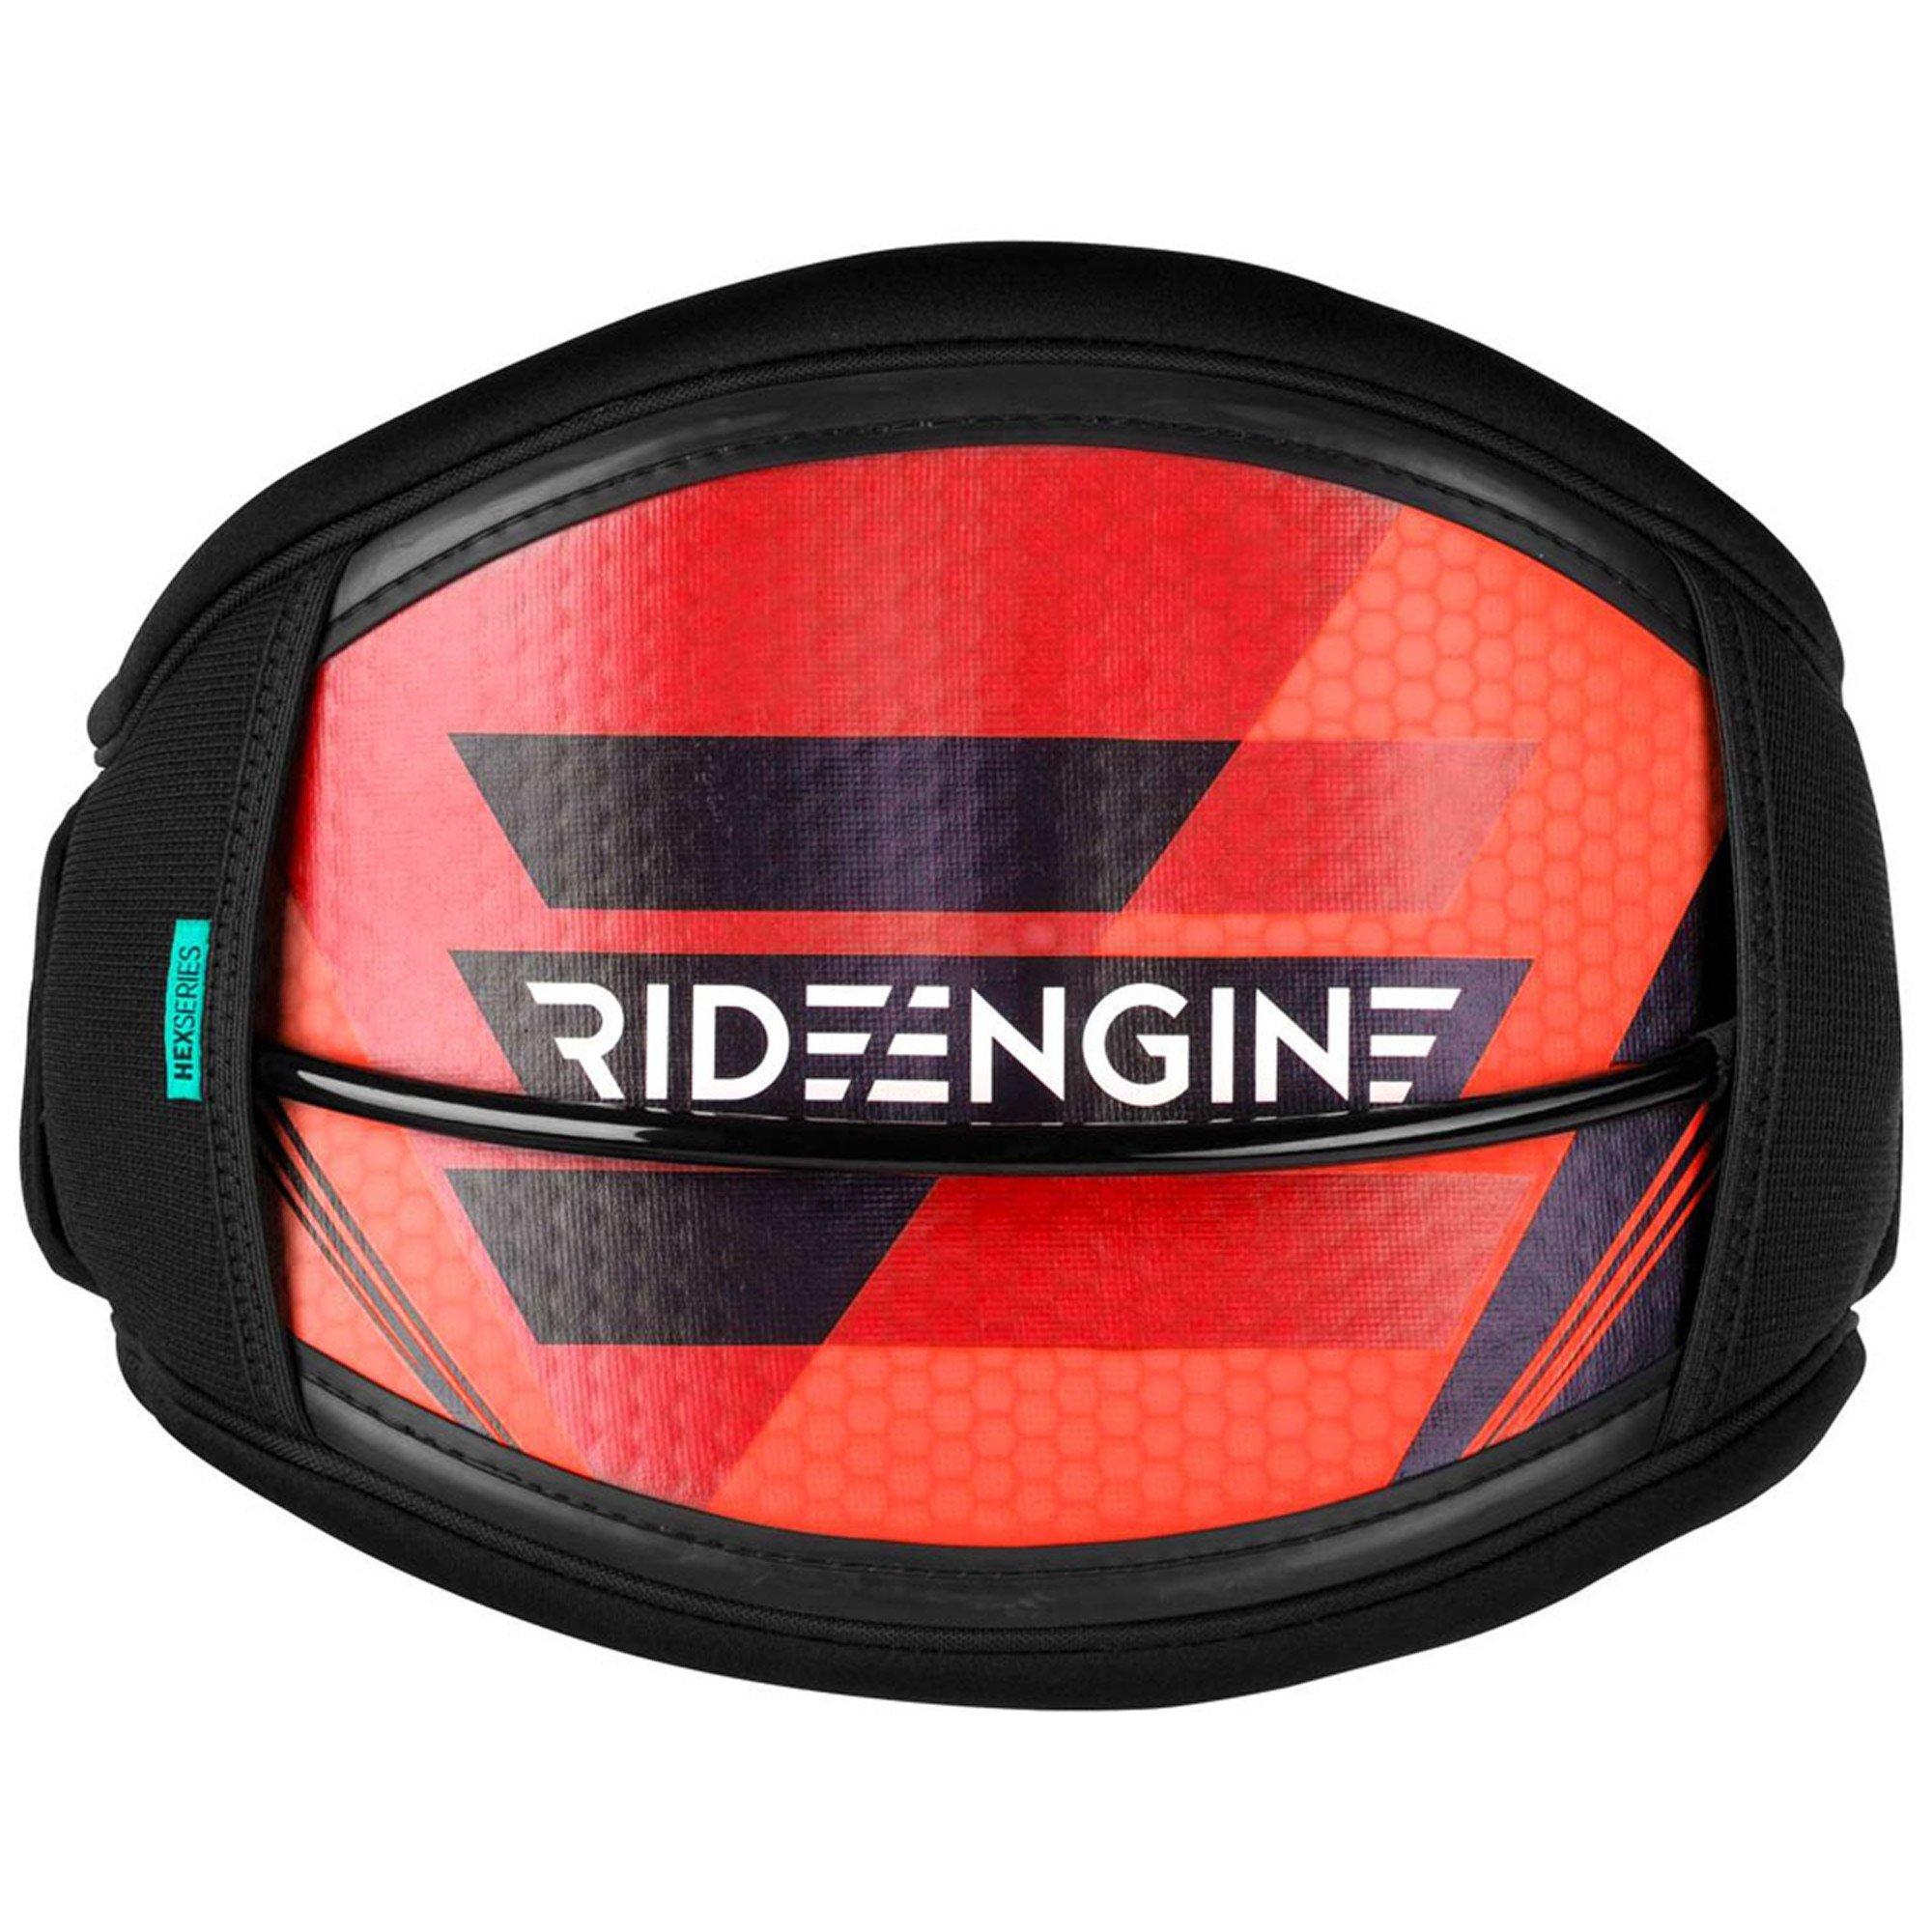 Ride Engine Kiteboarding HarnessHex-Core Orange Harness L by Ride Engine (Image #3)